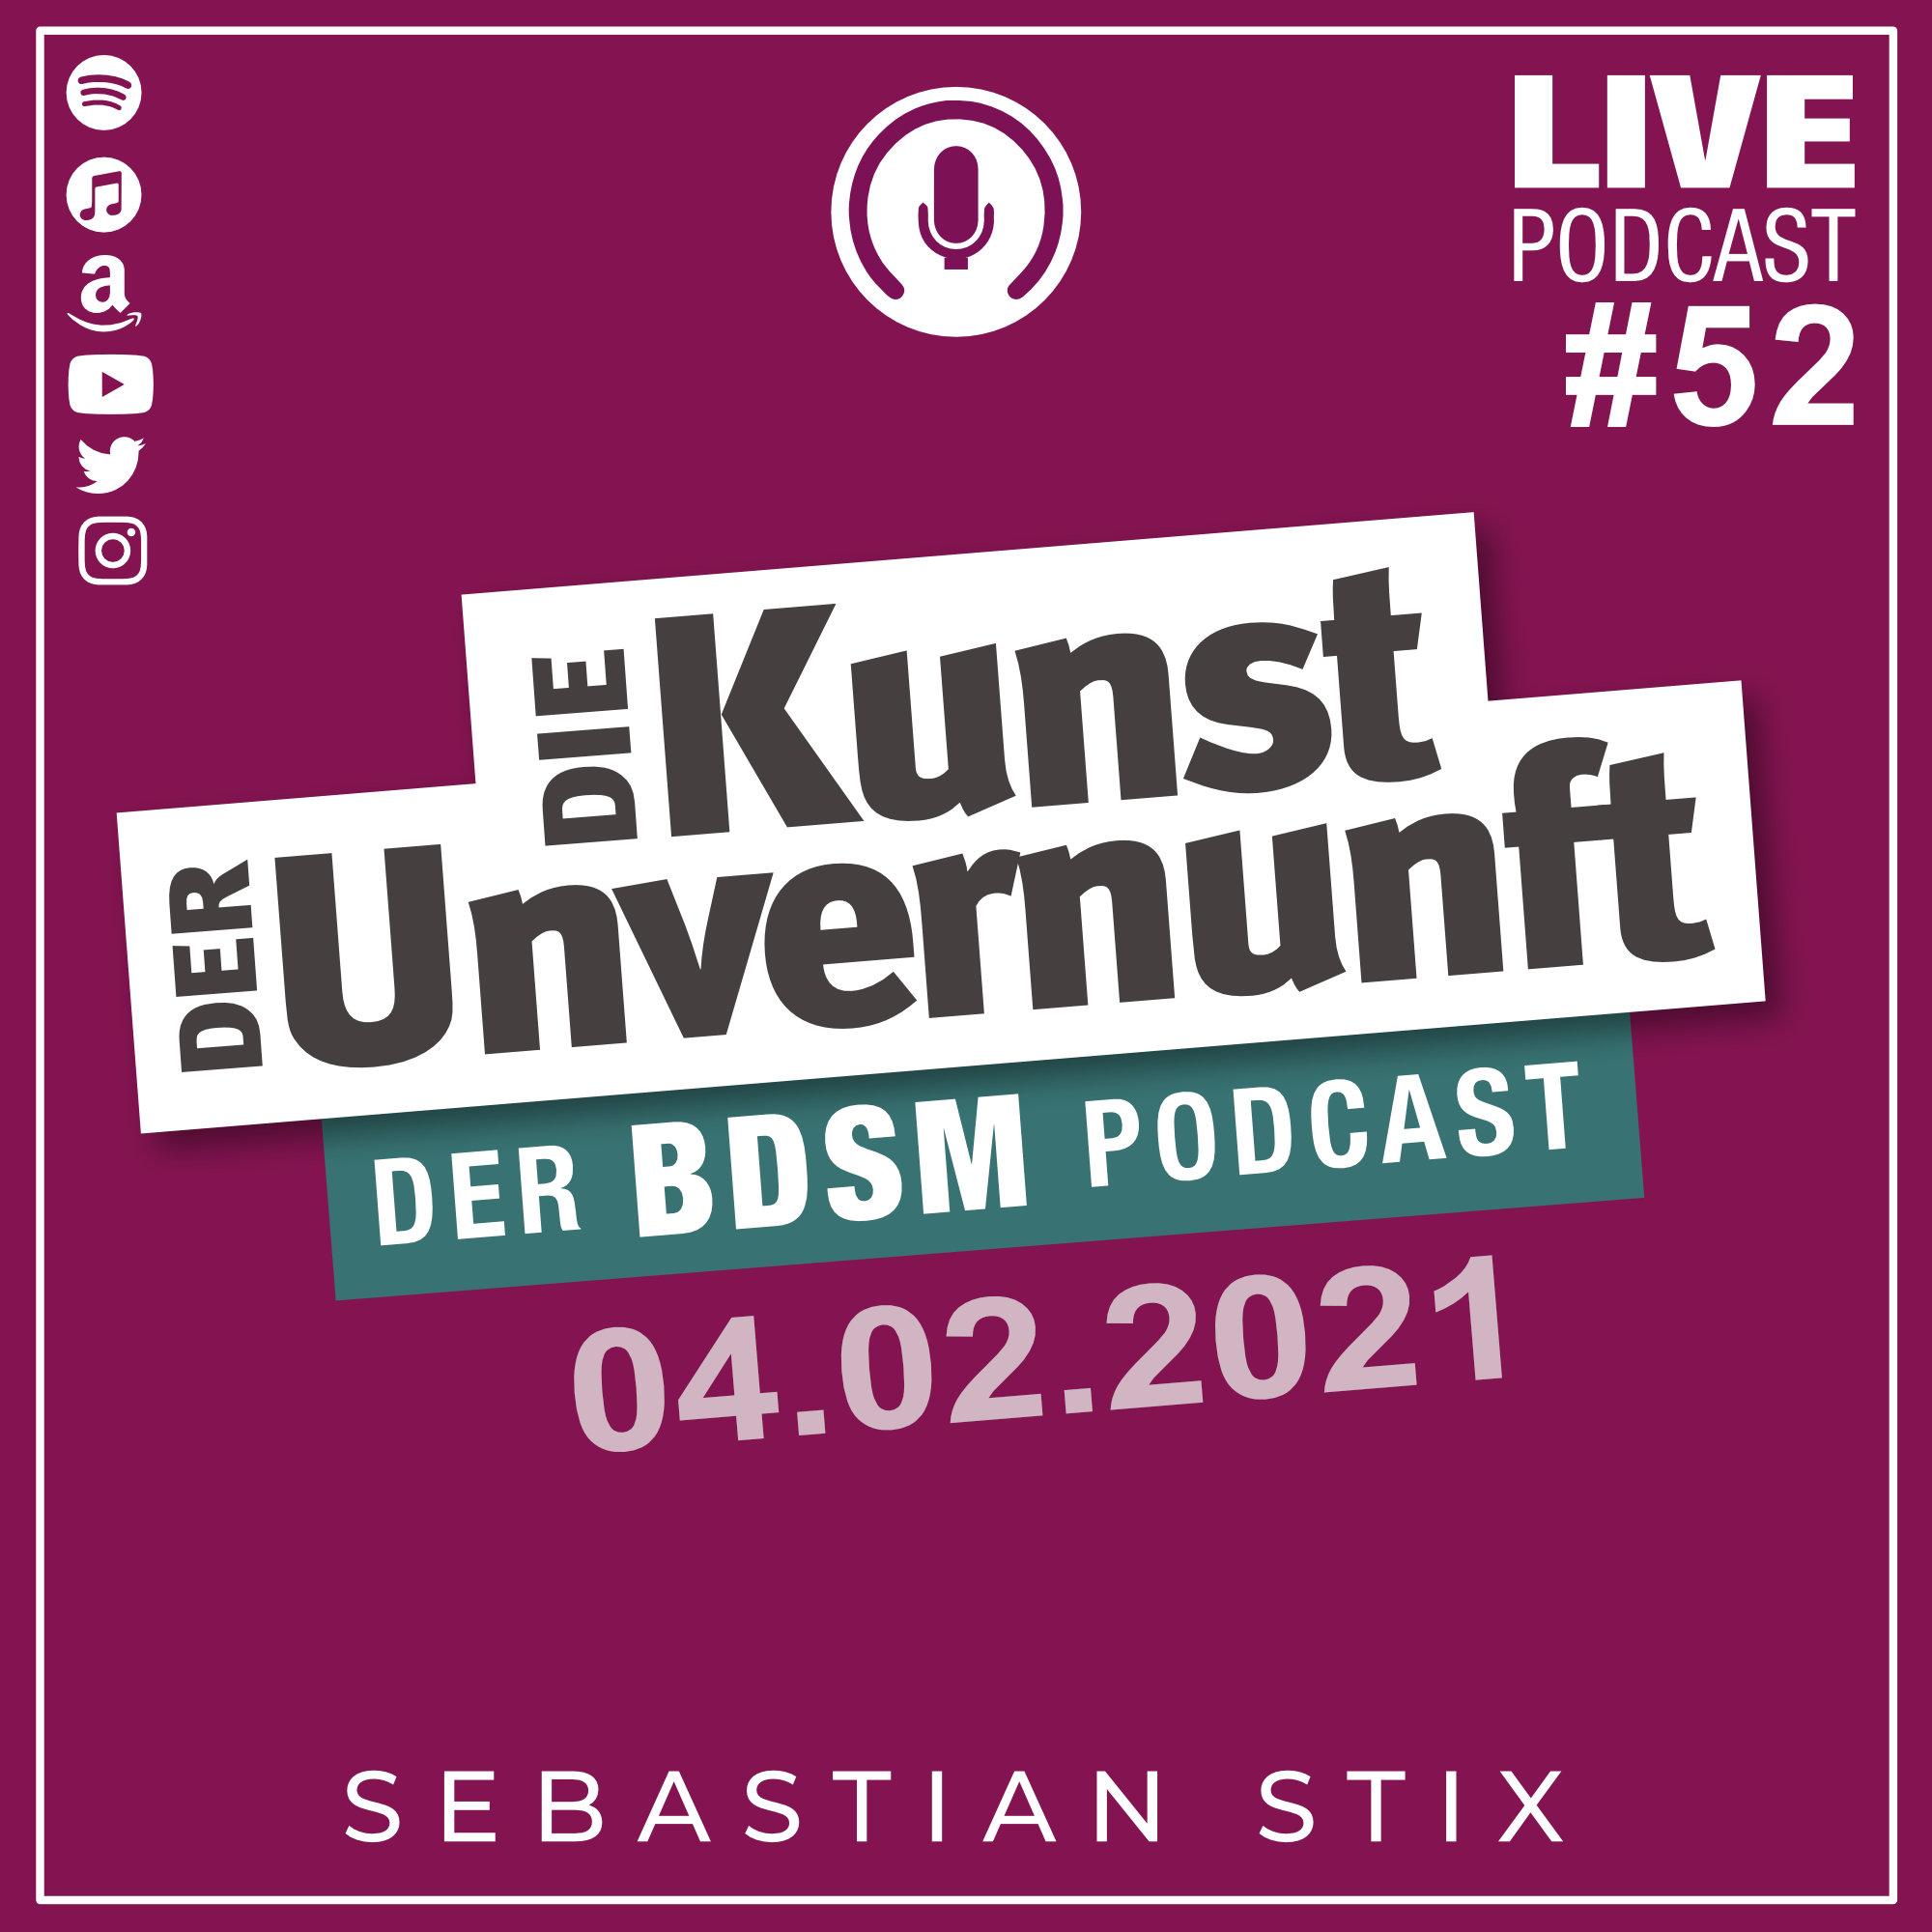 Unvernunft Live 04.02.2021 - Zartbitter-Herrenabend